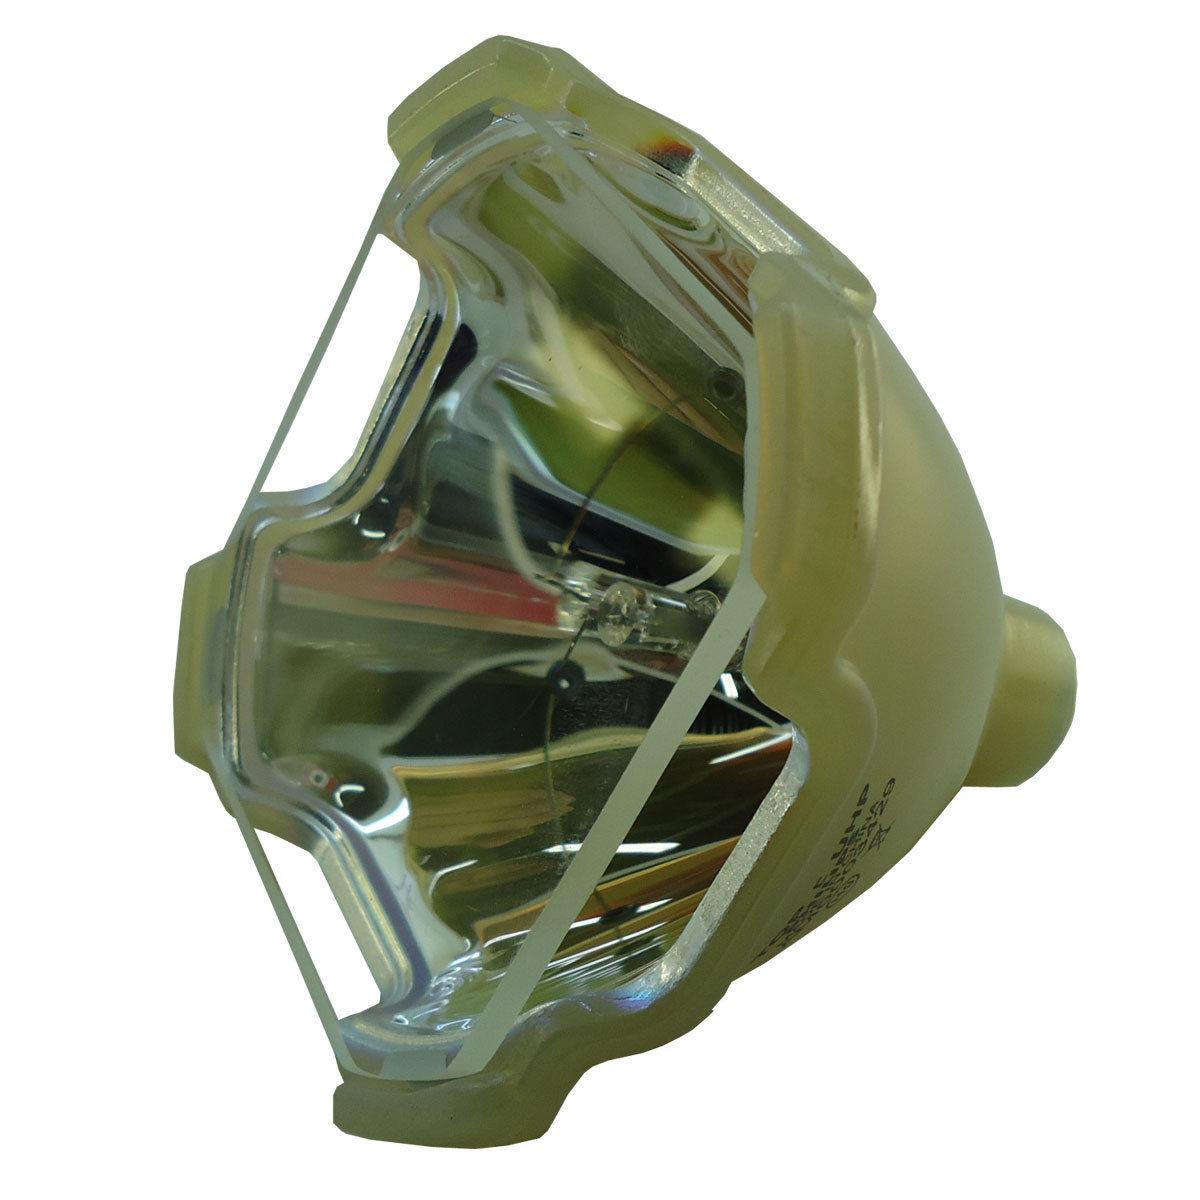 Compatibe Bare Bulb LMP-F300 LMPF300 for Sony VPL-FX51 VPL-FX52 VPL-FX52L VPL-PX51 Projector Lamp Bulb without housing replacement projector lamp bulb lmp f300 for sony vpl fx51 vpl fx52 vpl fx52l vpl px51 projectors